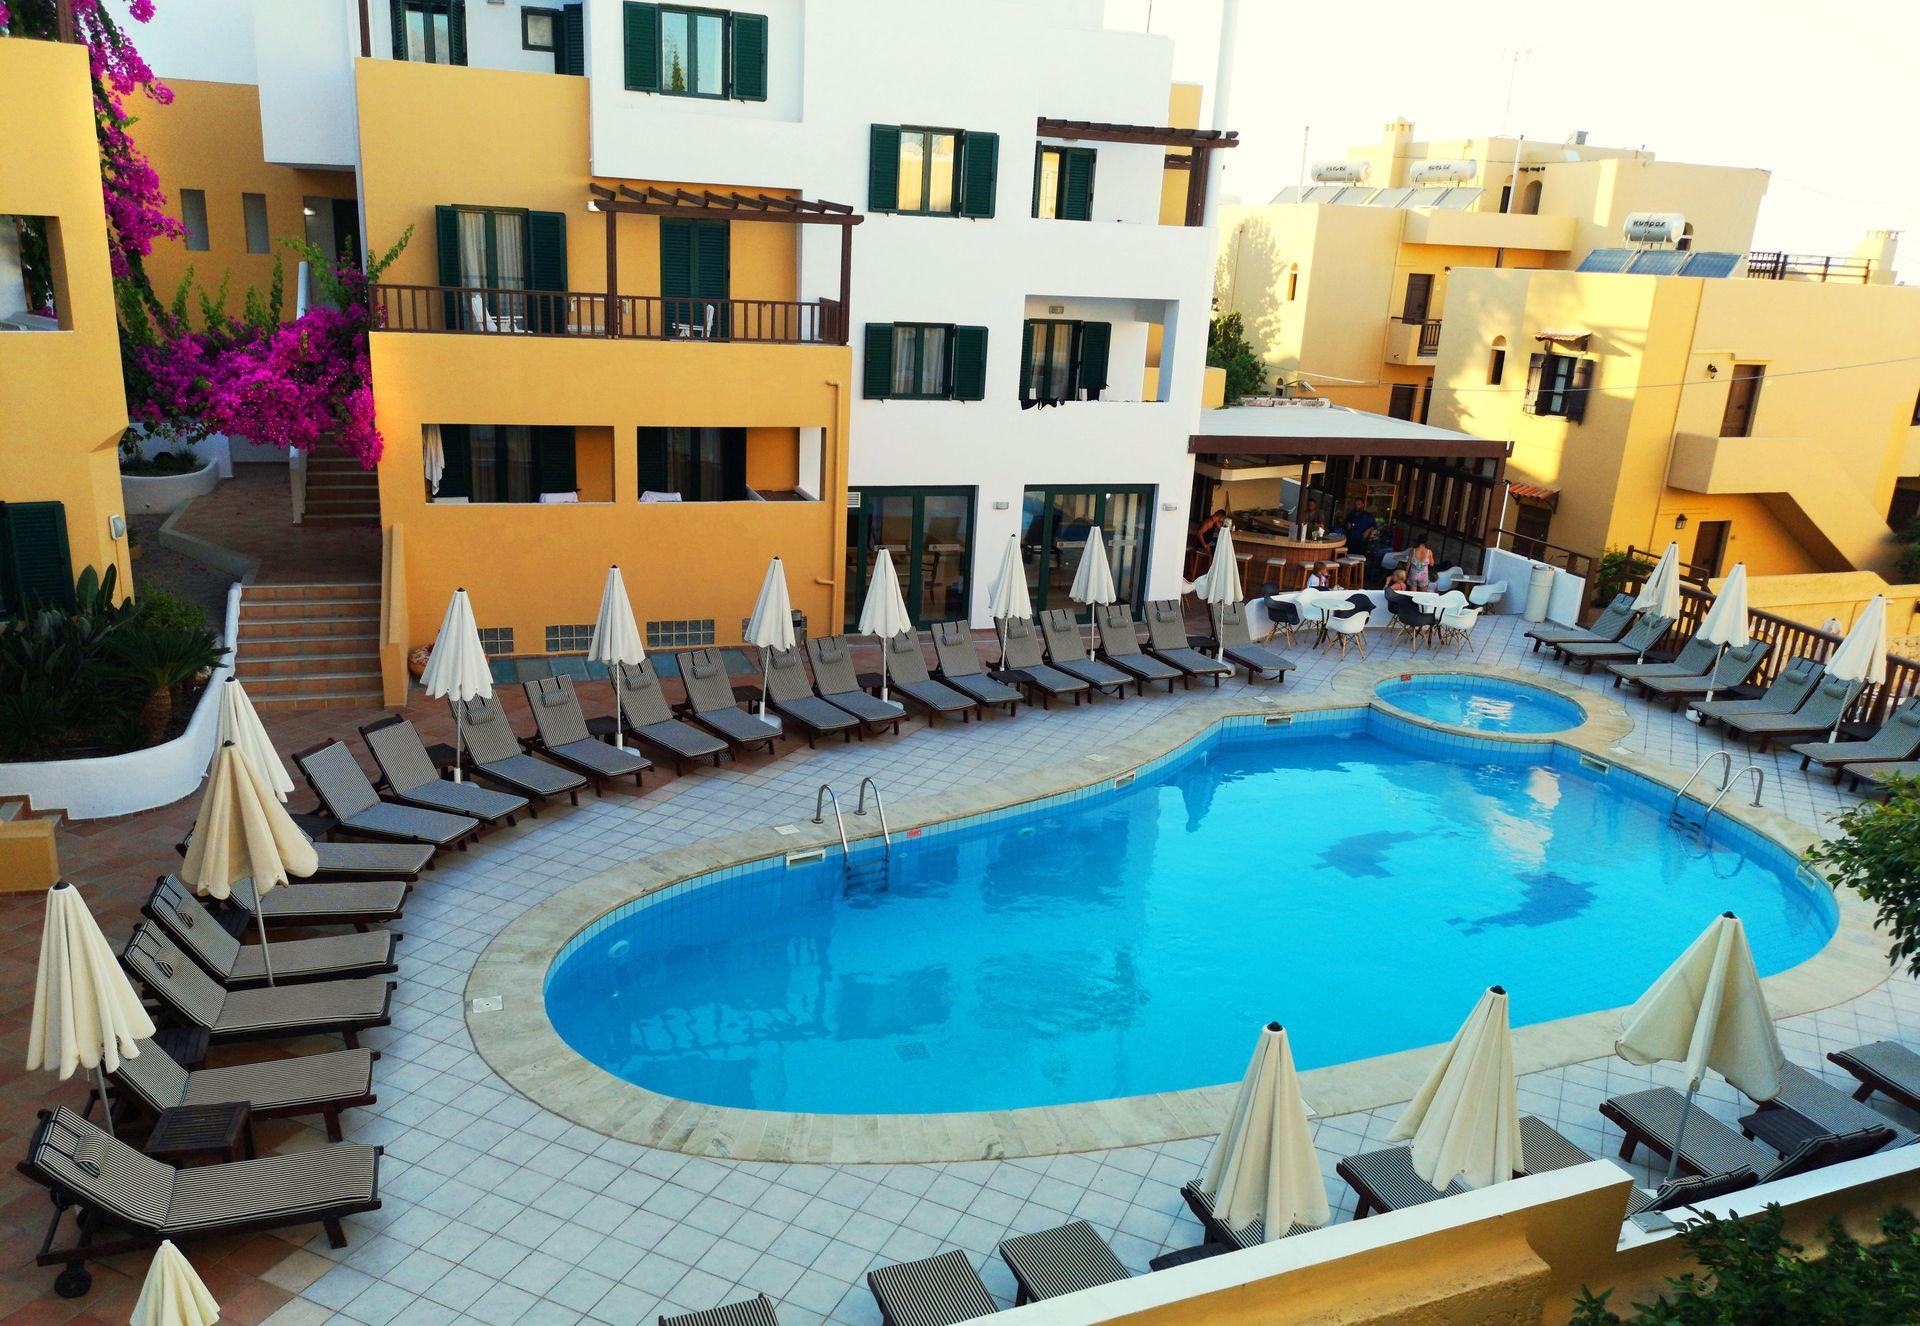 Elmi Suites - Χερσόνησος, Κρήτη ✦ 2 Ημέρες (1 Διανυκτέρευση) ✦ 2 άτομα ✦ Ημιδιατροφή ✦ 30/08/2020 έως 26/09/2020 ✦ Free WiFi!